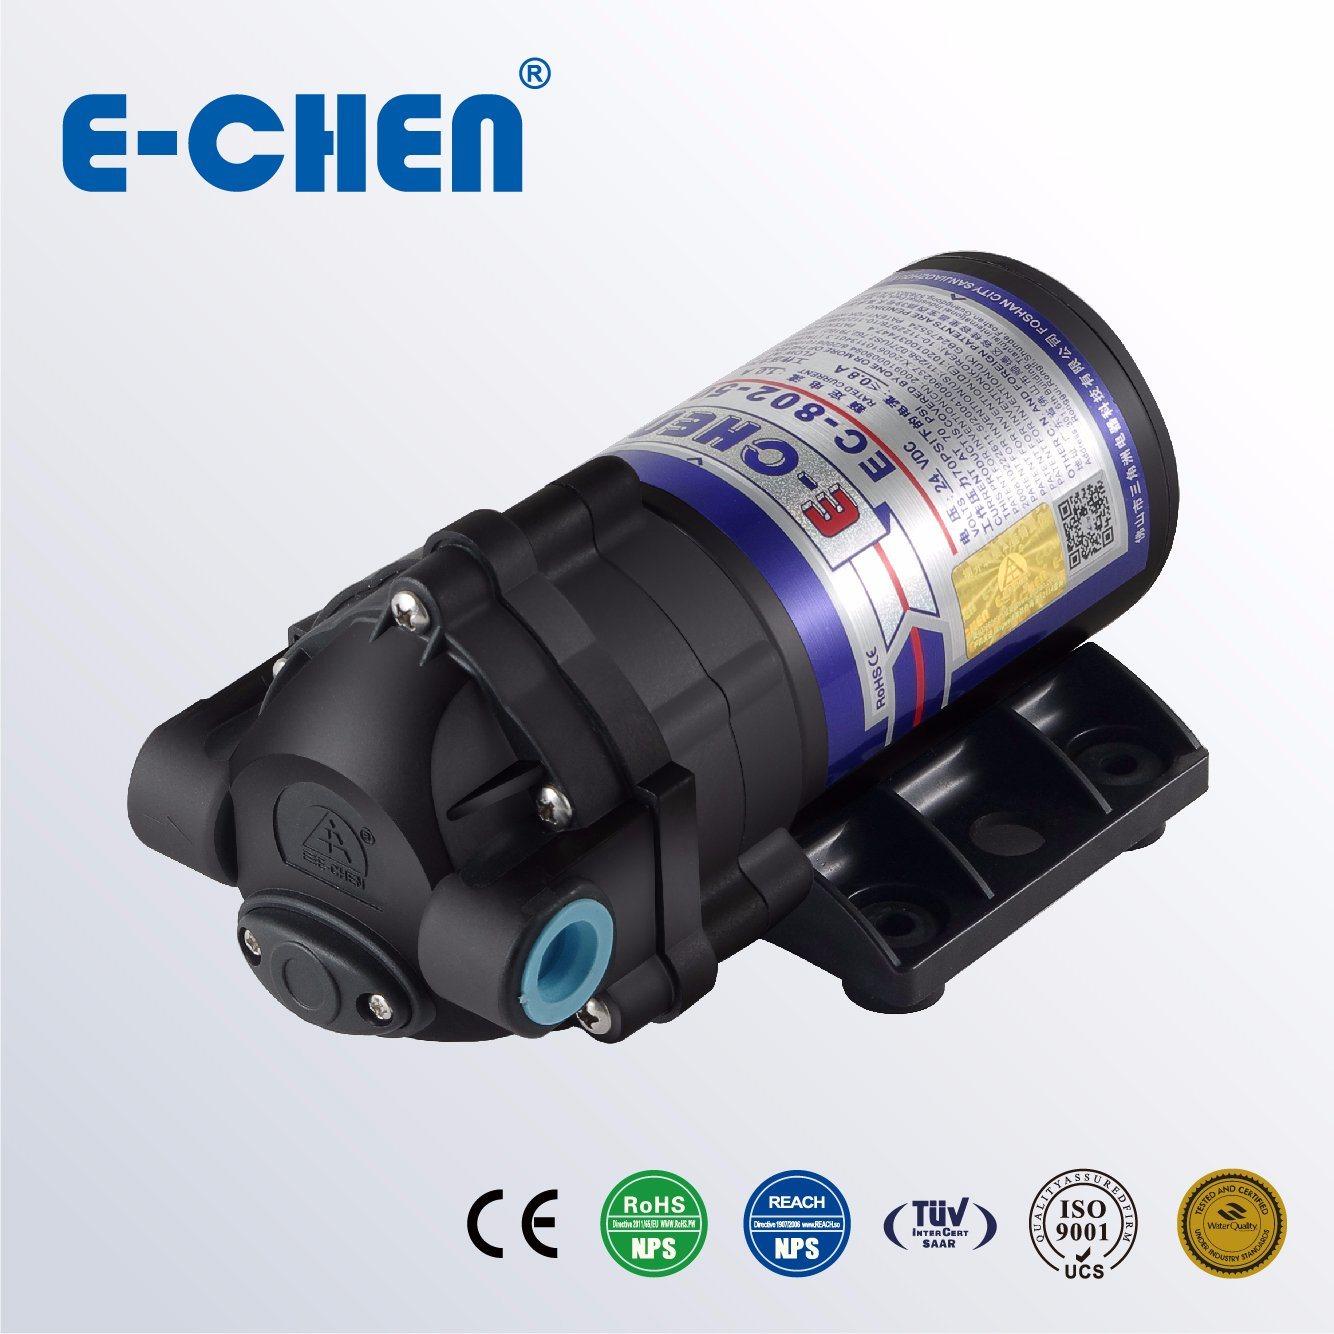 E-Chen 802 Series 75gpd Compact Diaphragm RO Booster Water Pump